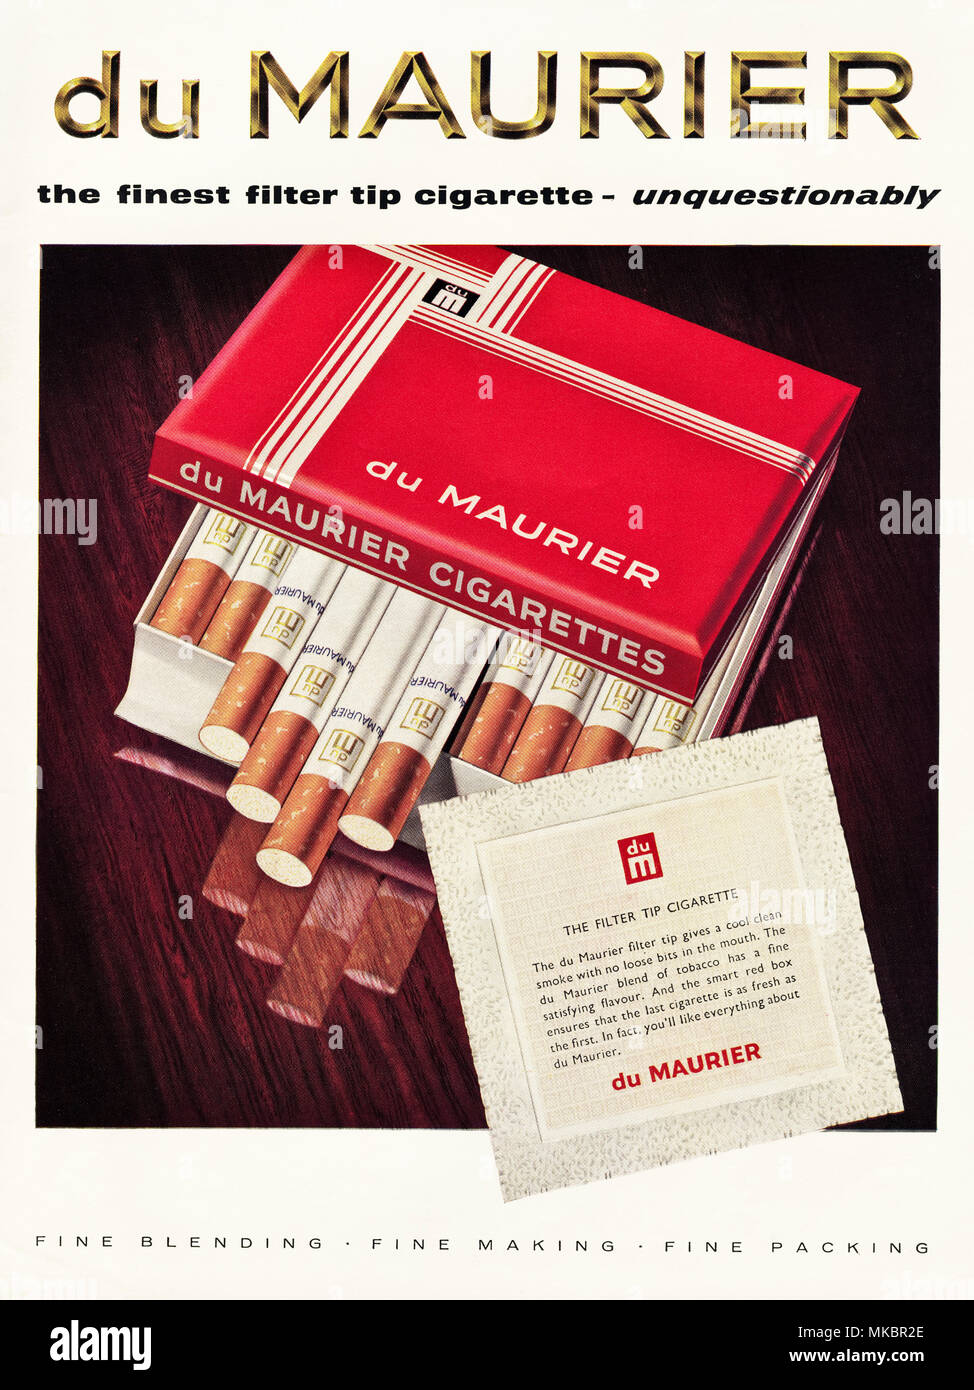 1950s vintage original advertisement advertising du Maurier filter tip cigarettes in English magazine circa 1958 - Stock Image